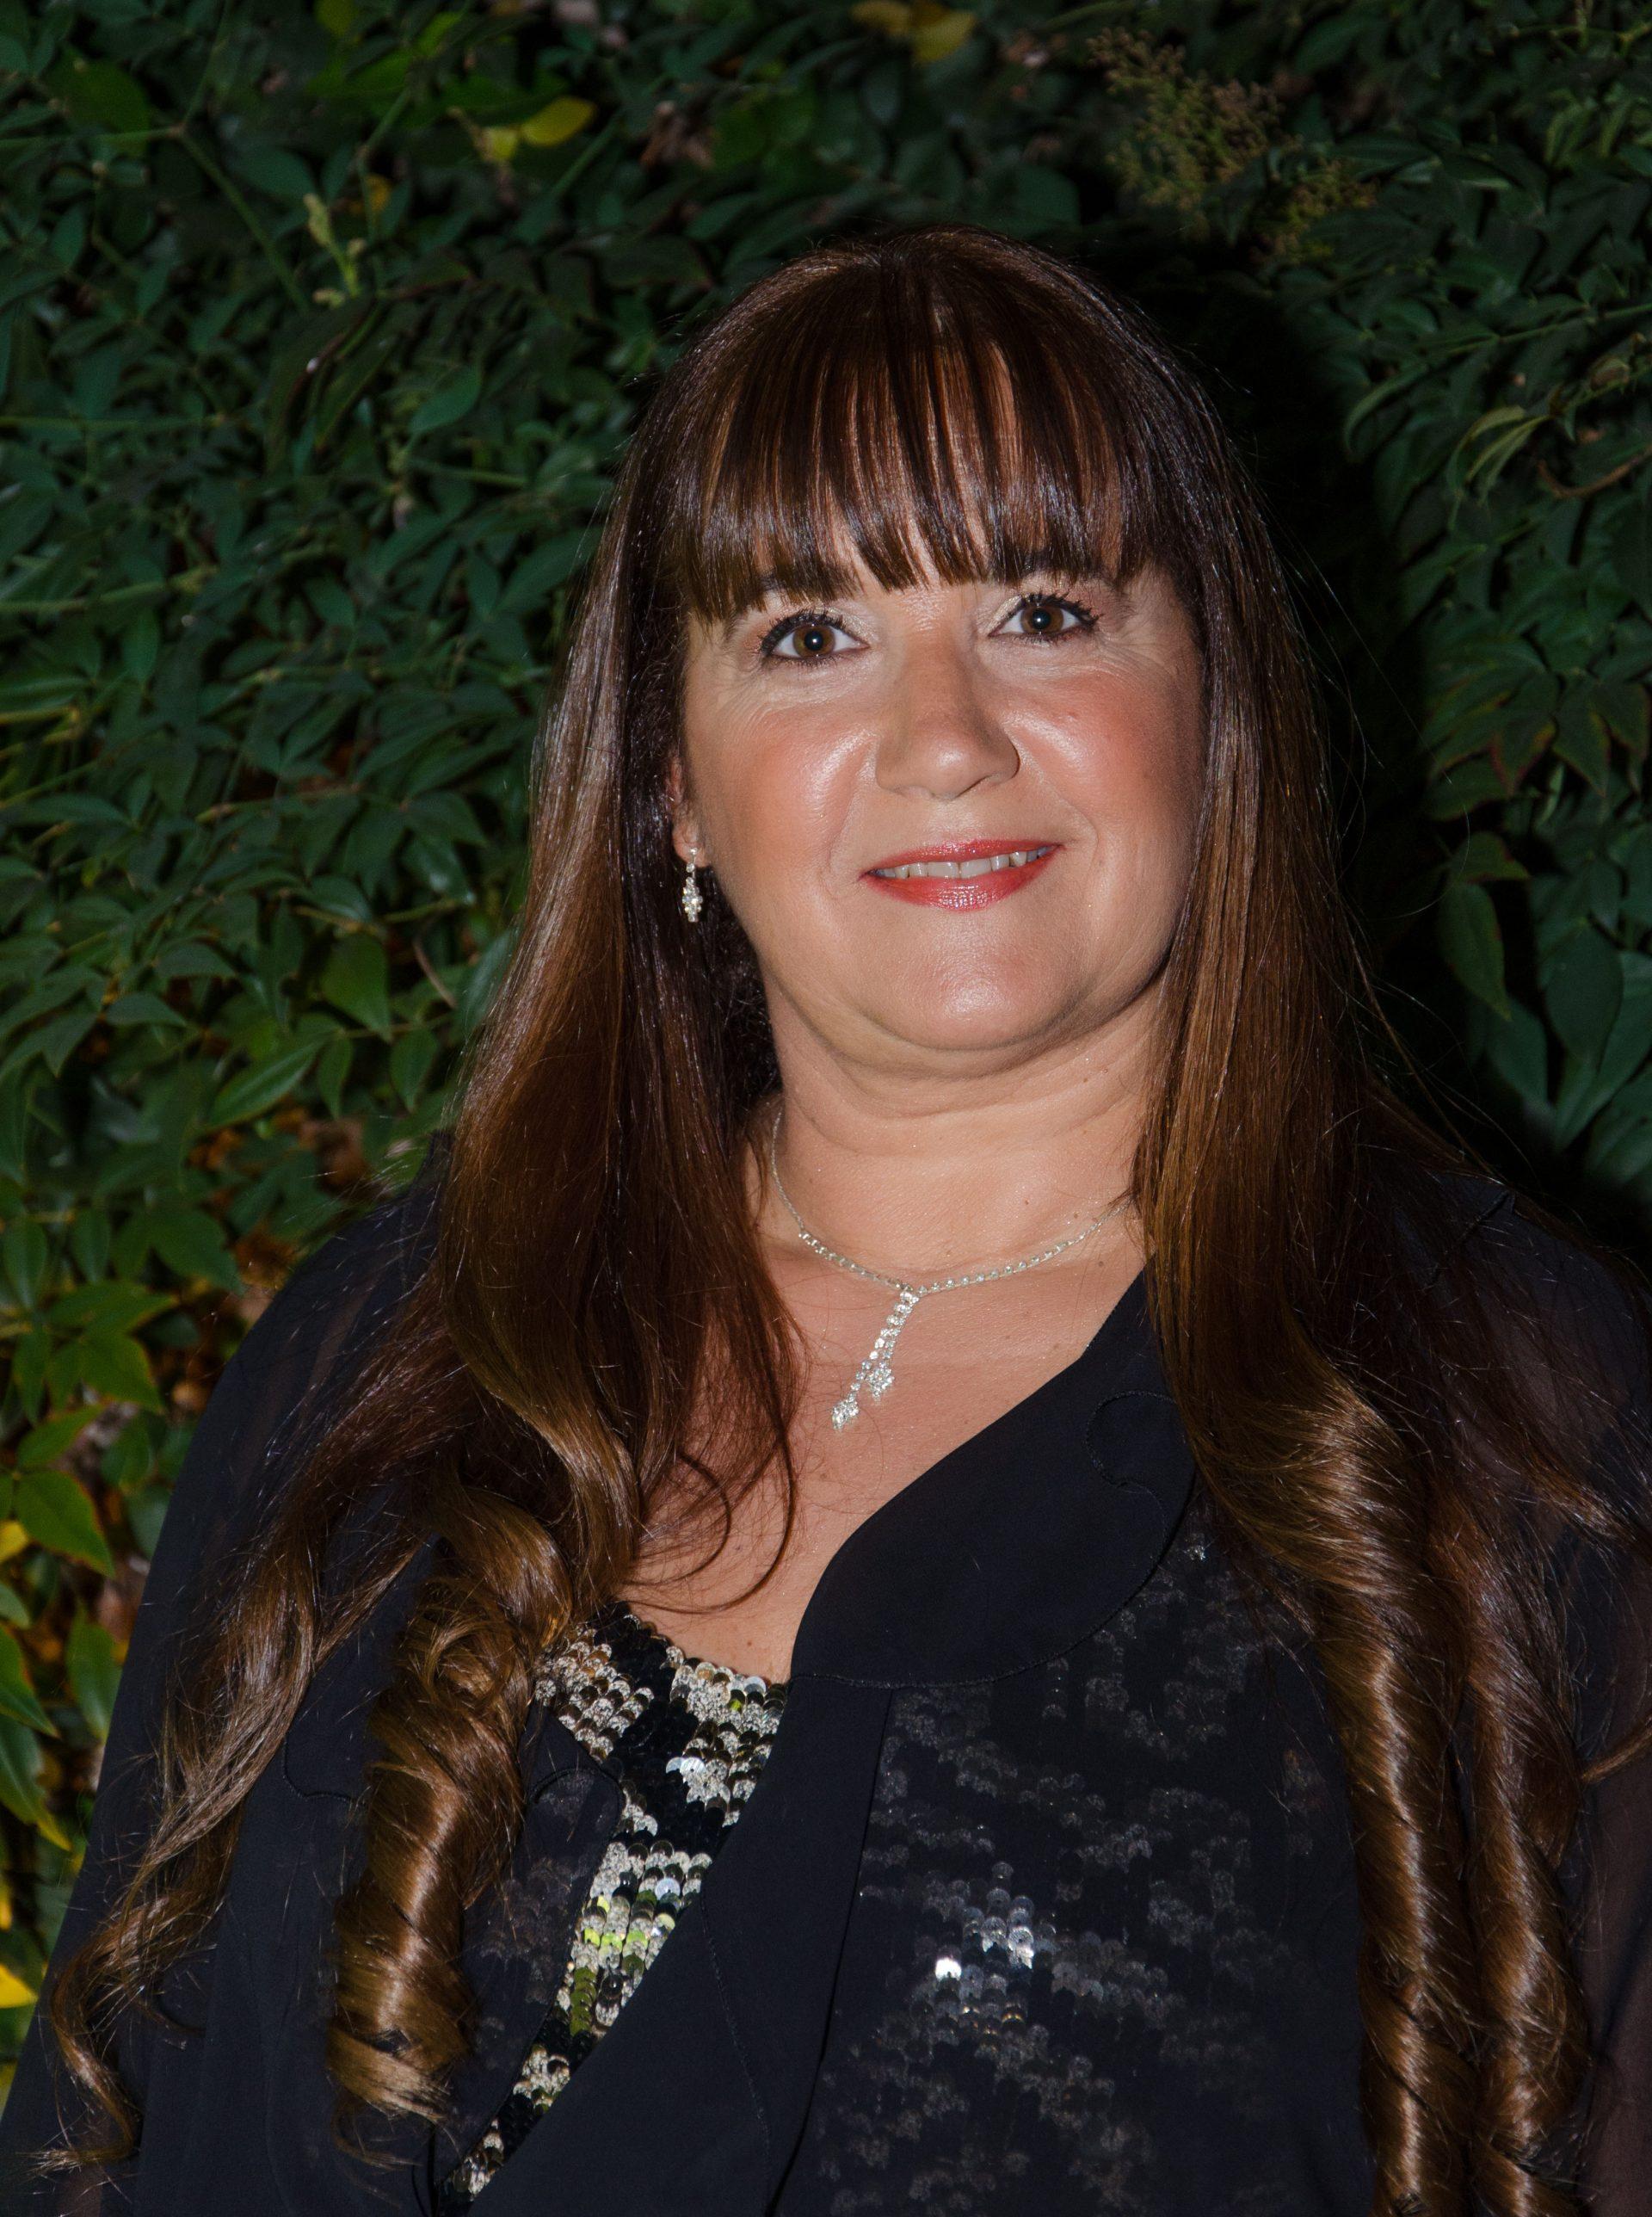 claudia alvarez coach ontologico foto de perfil